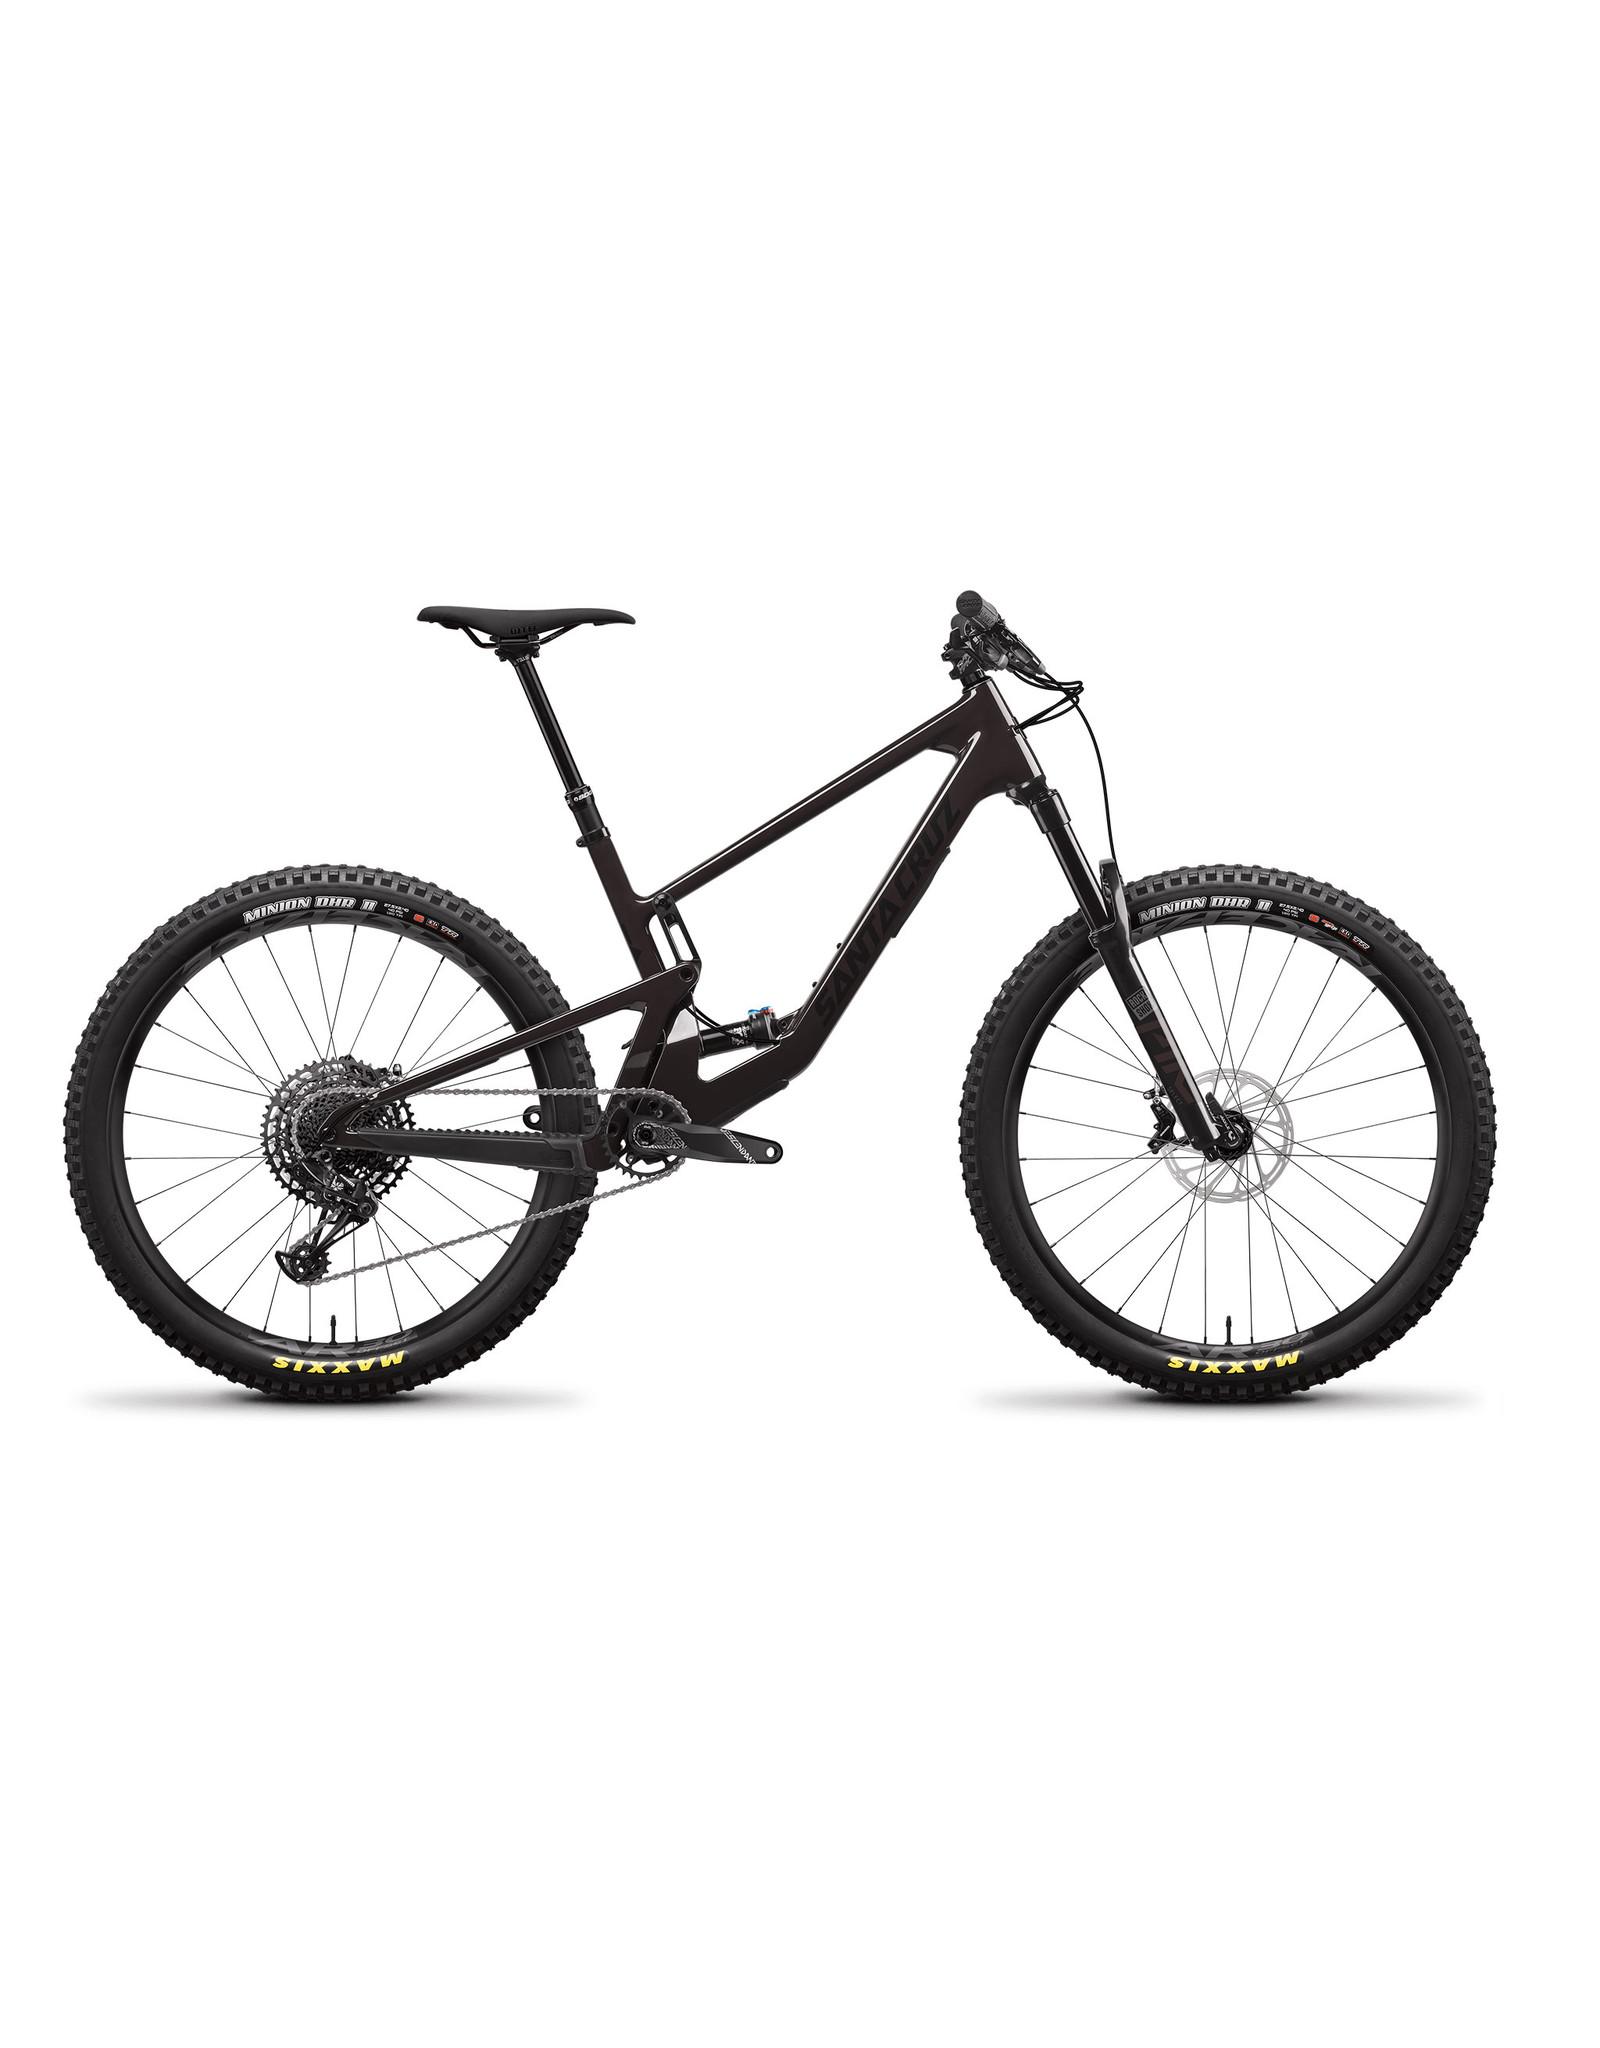 Santa Cruz 2022 Santa Cruz 5010, R-Build, Purple, Medium